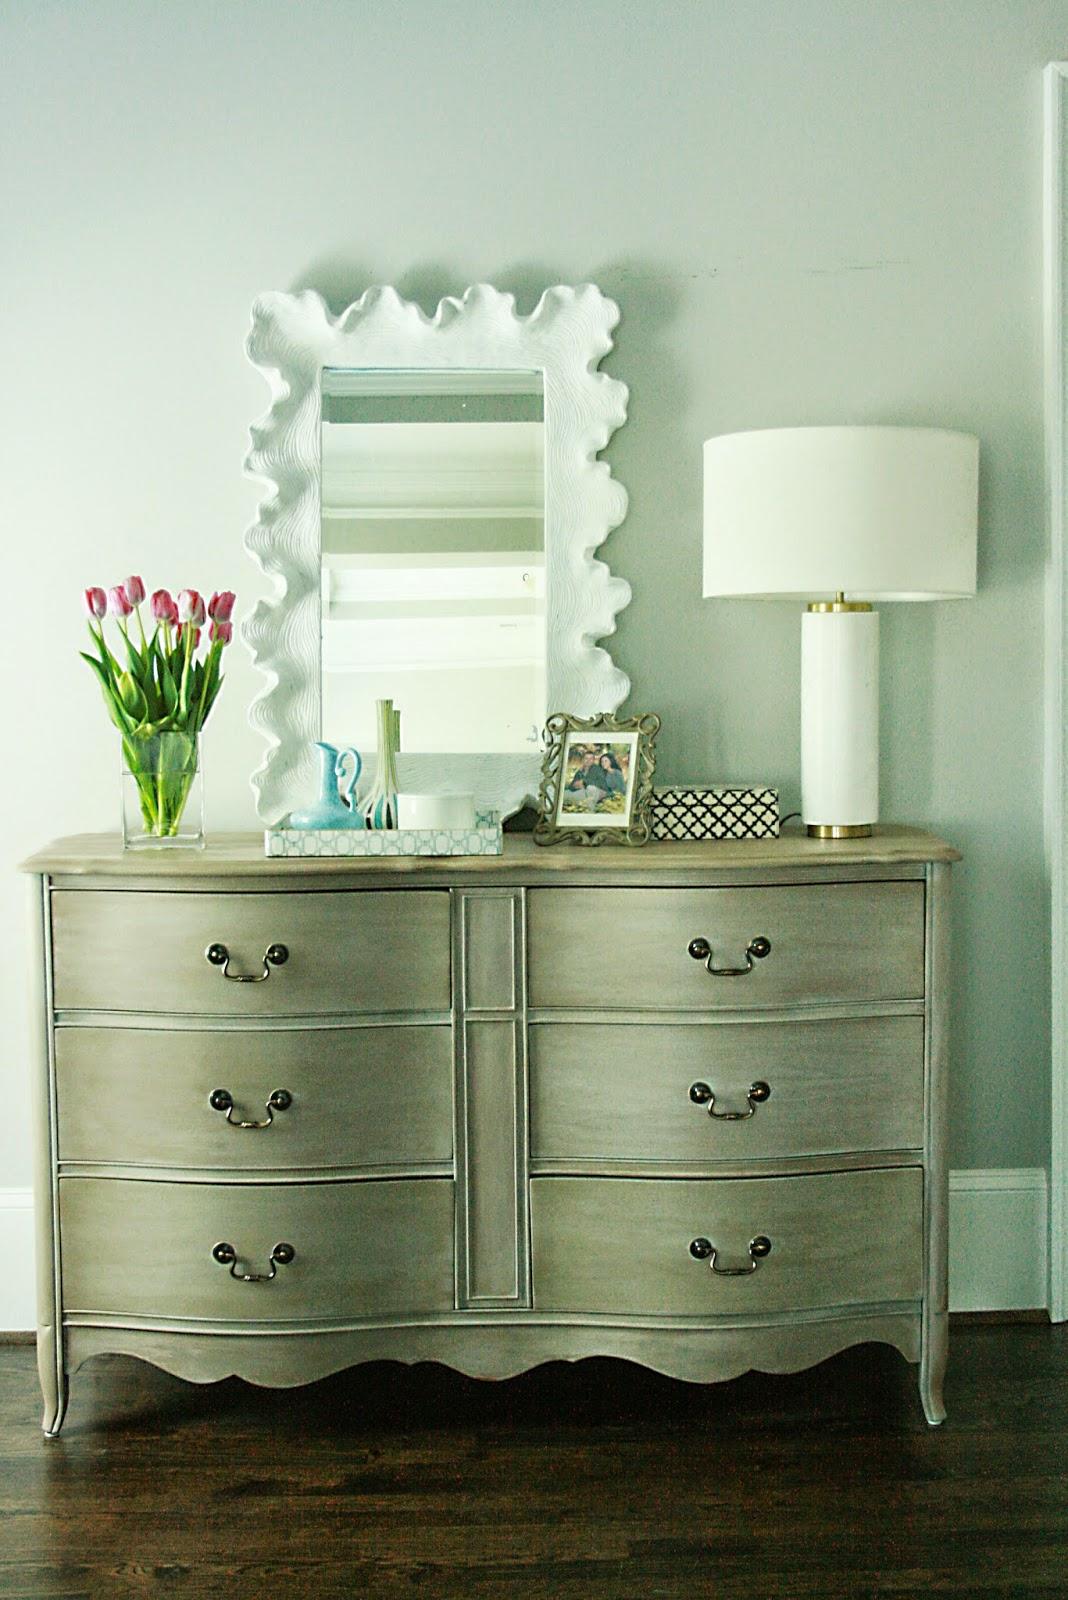 diy, staining, vintage dresser, renovation, refinishing